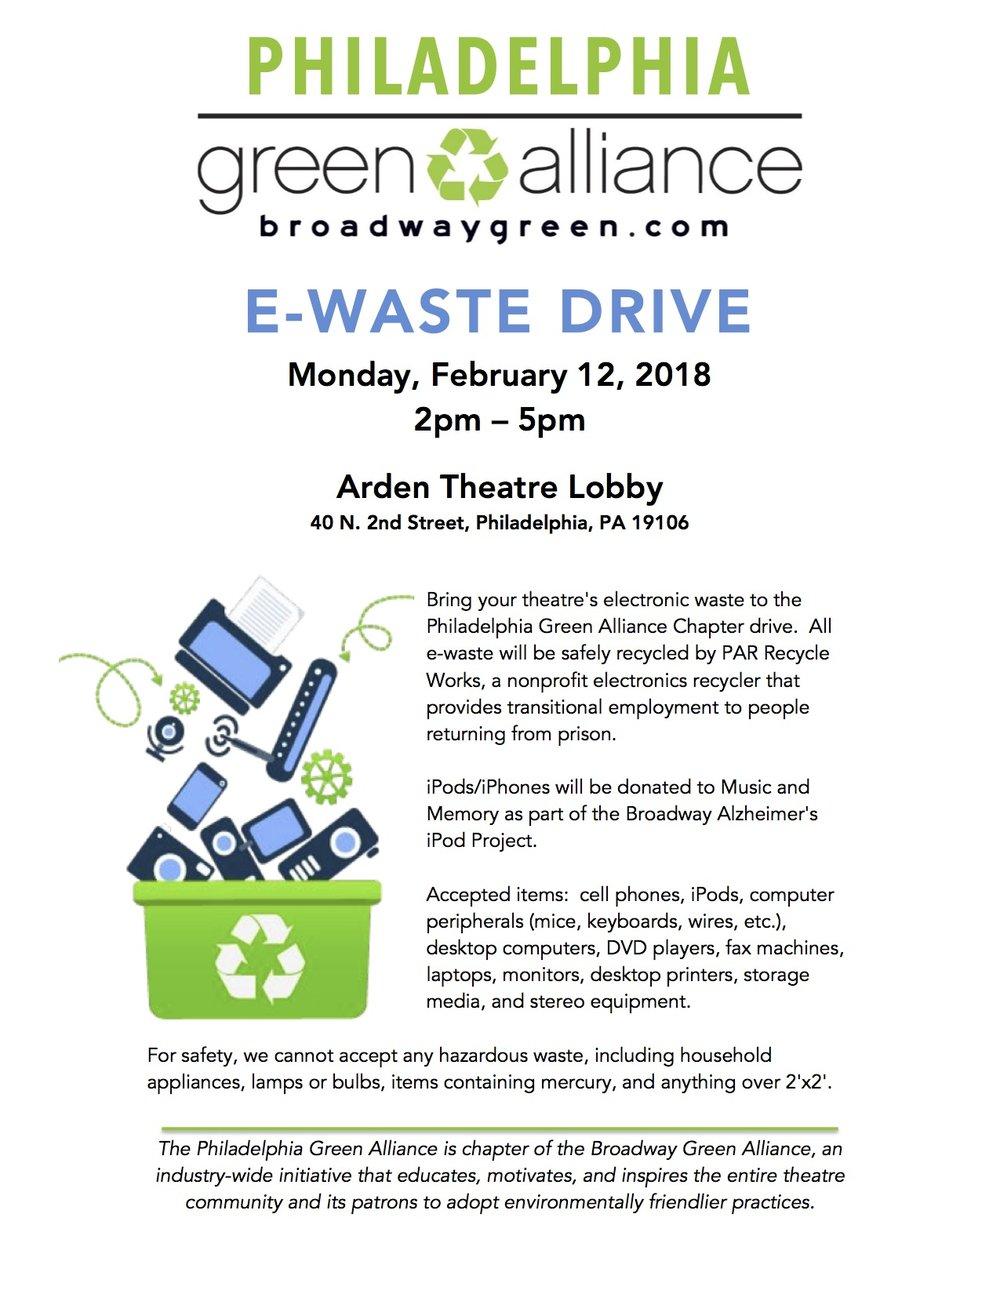 Philadelphia Green Alliance - E-Waste Drive 2018.jpg